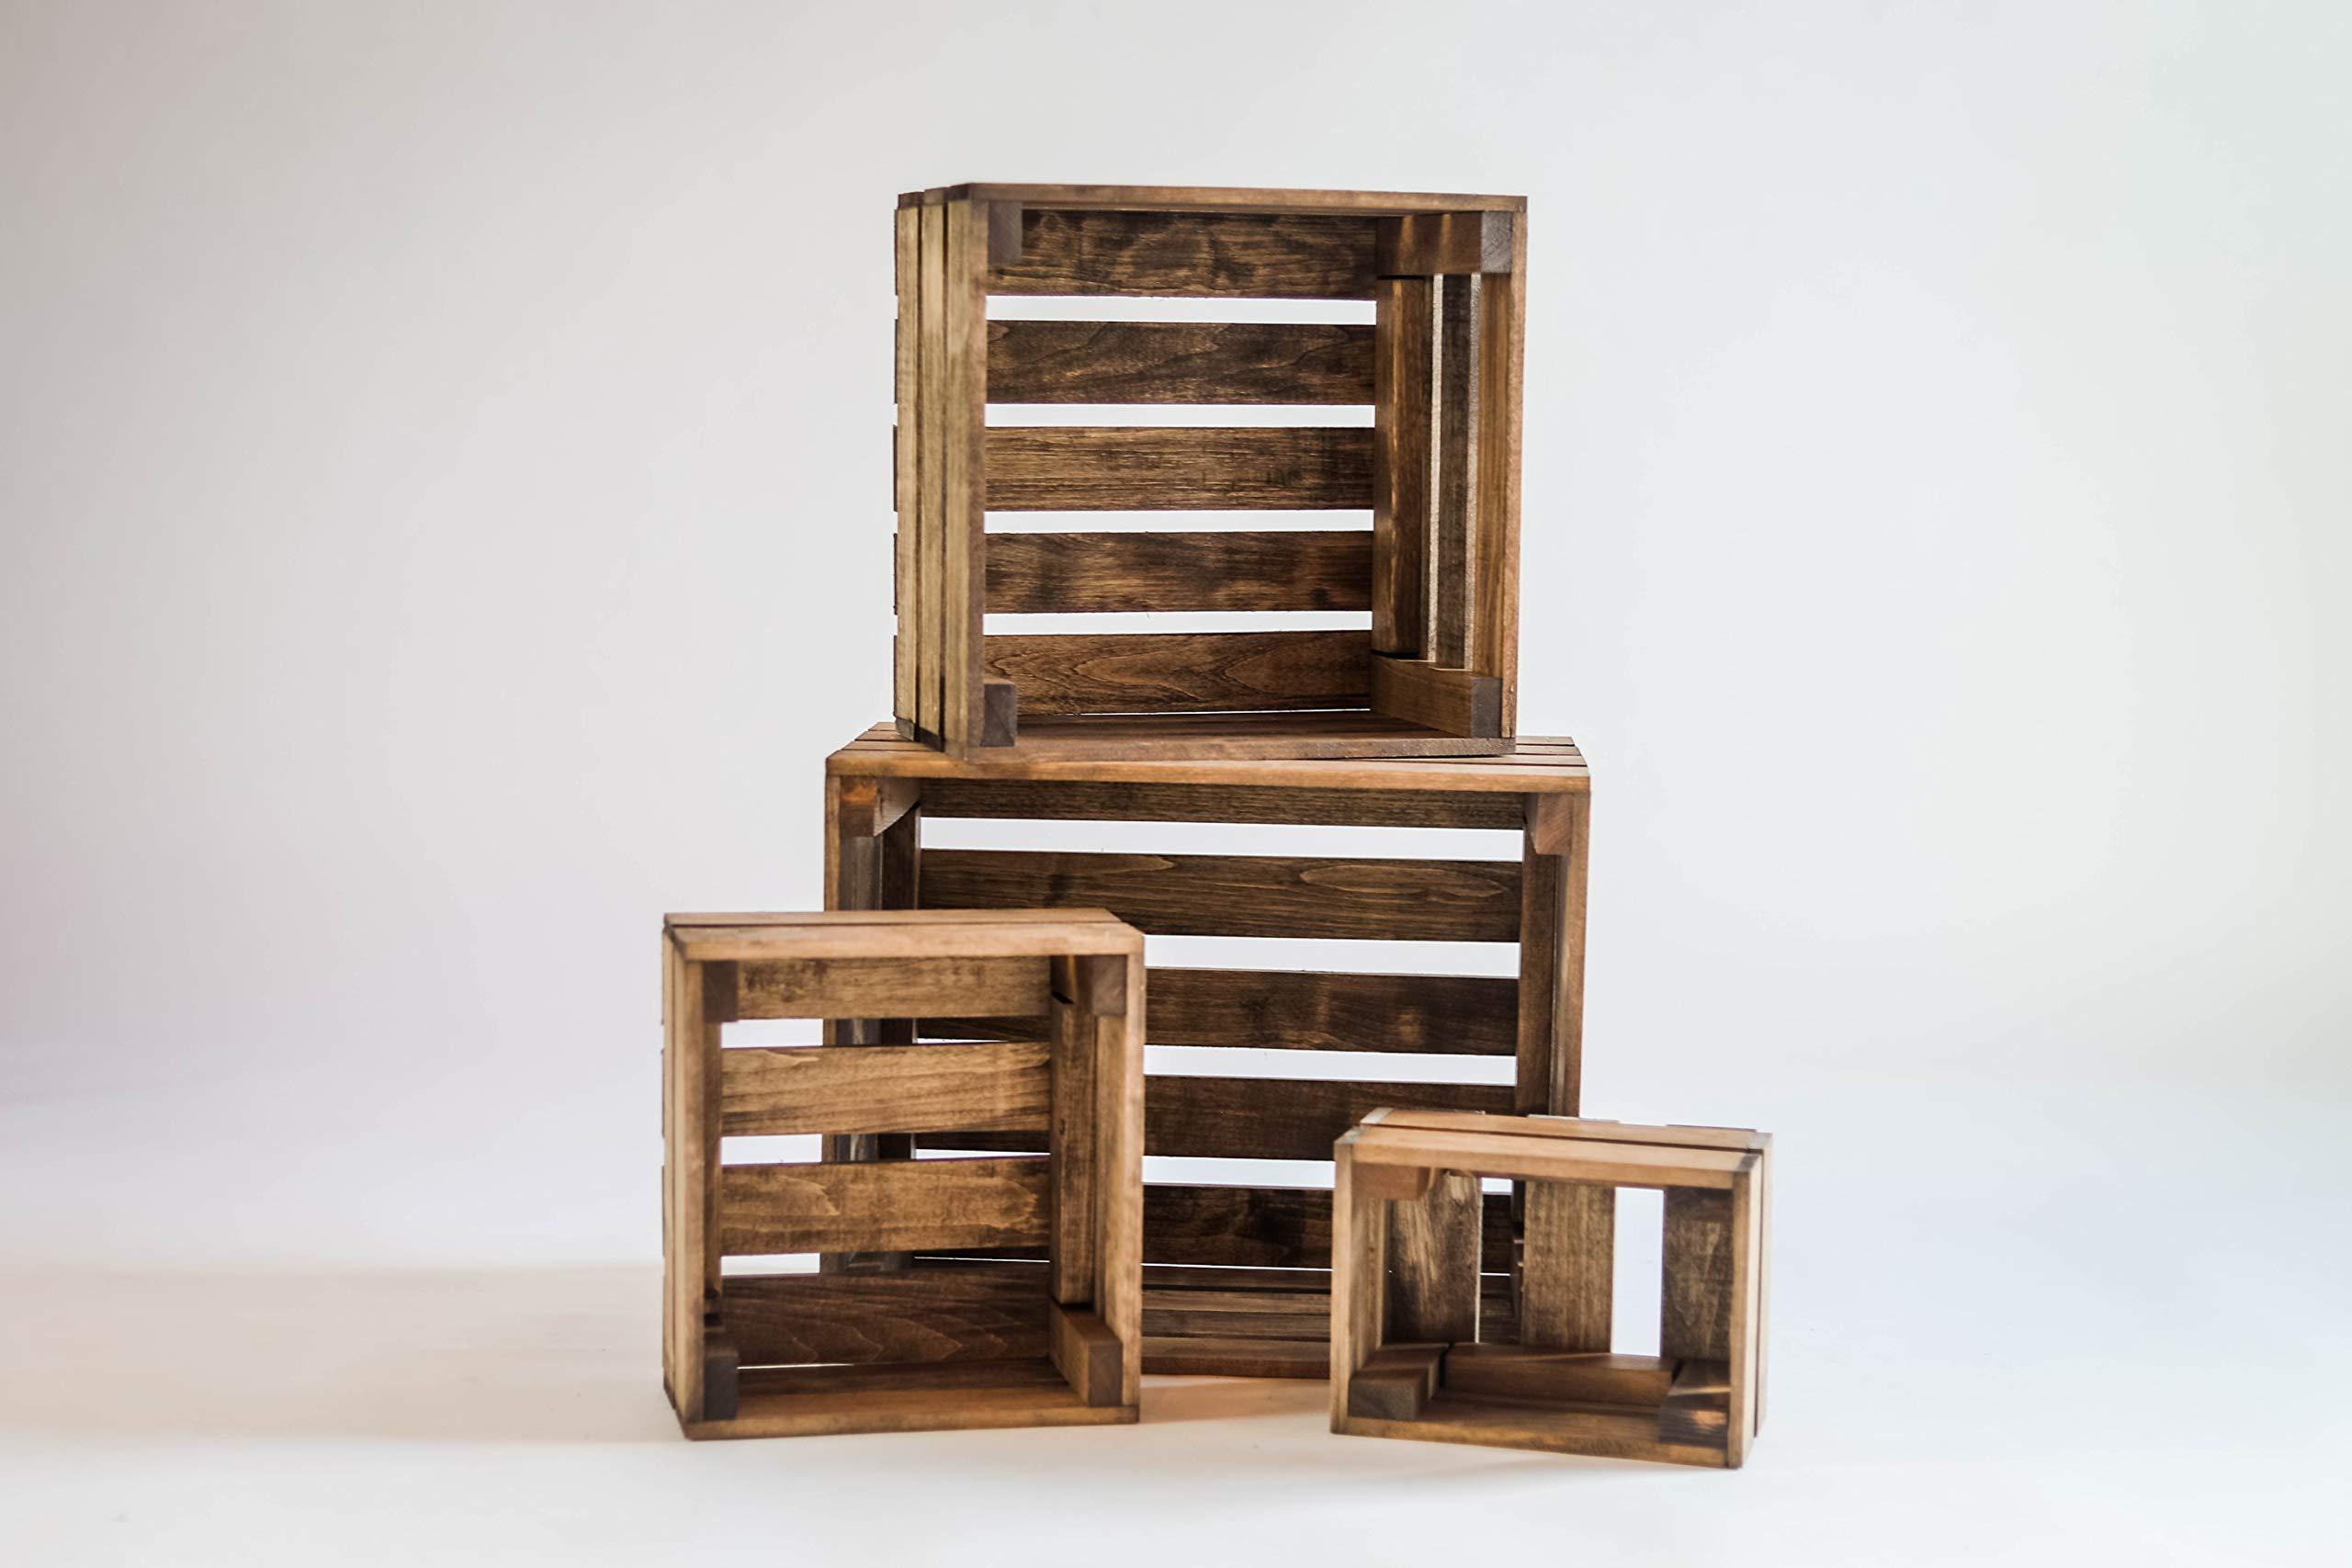 Darla'Studio 66 Wooden Nesting Boxes/Wood Crates by Darla'Studio 66